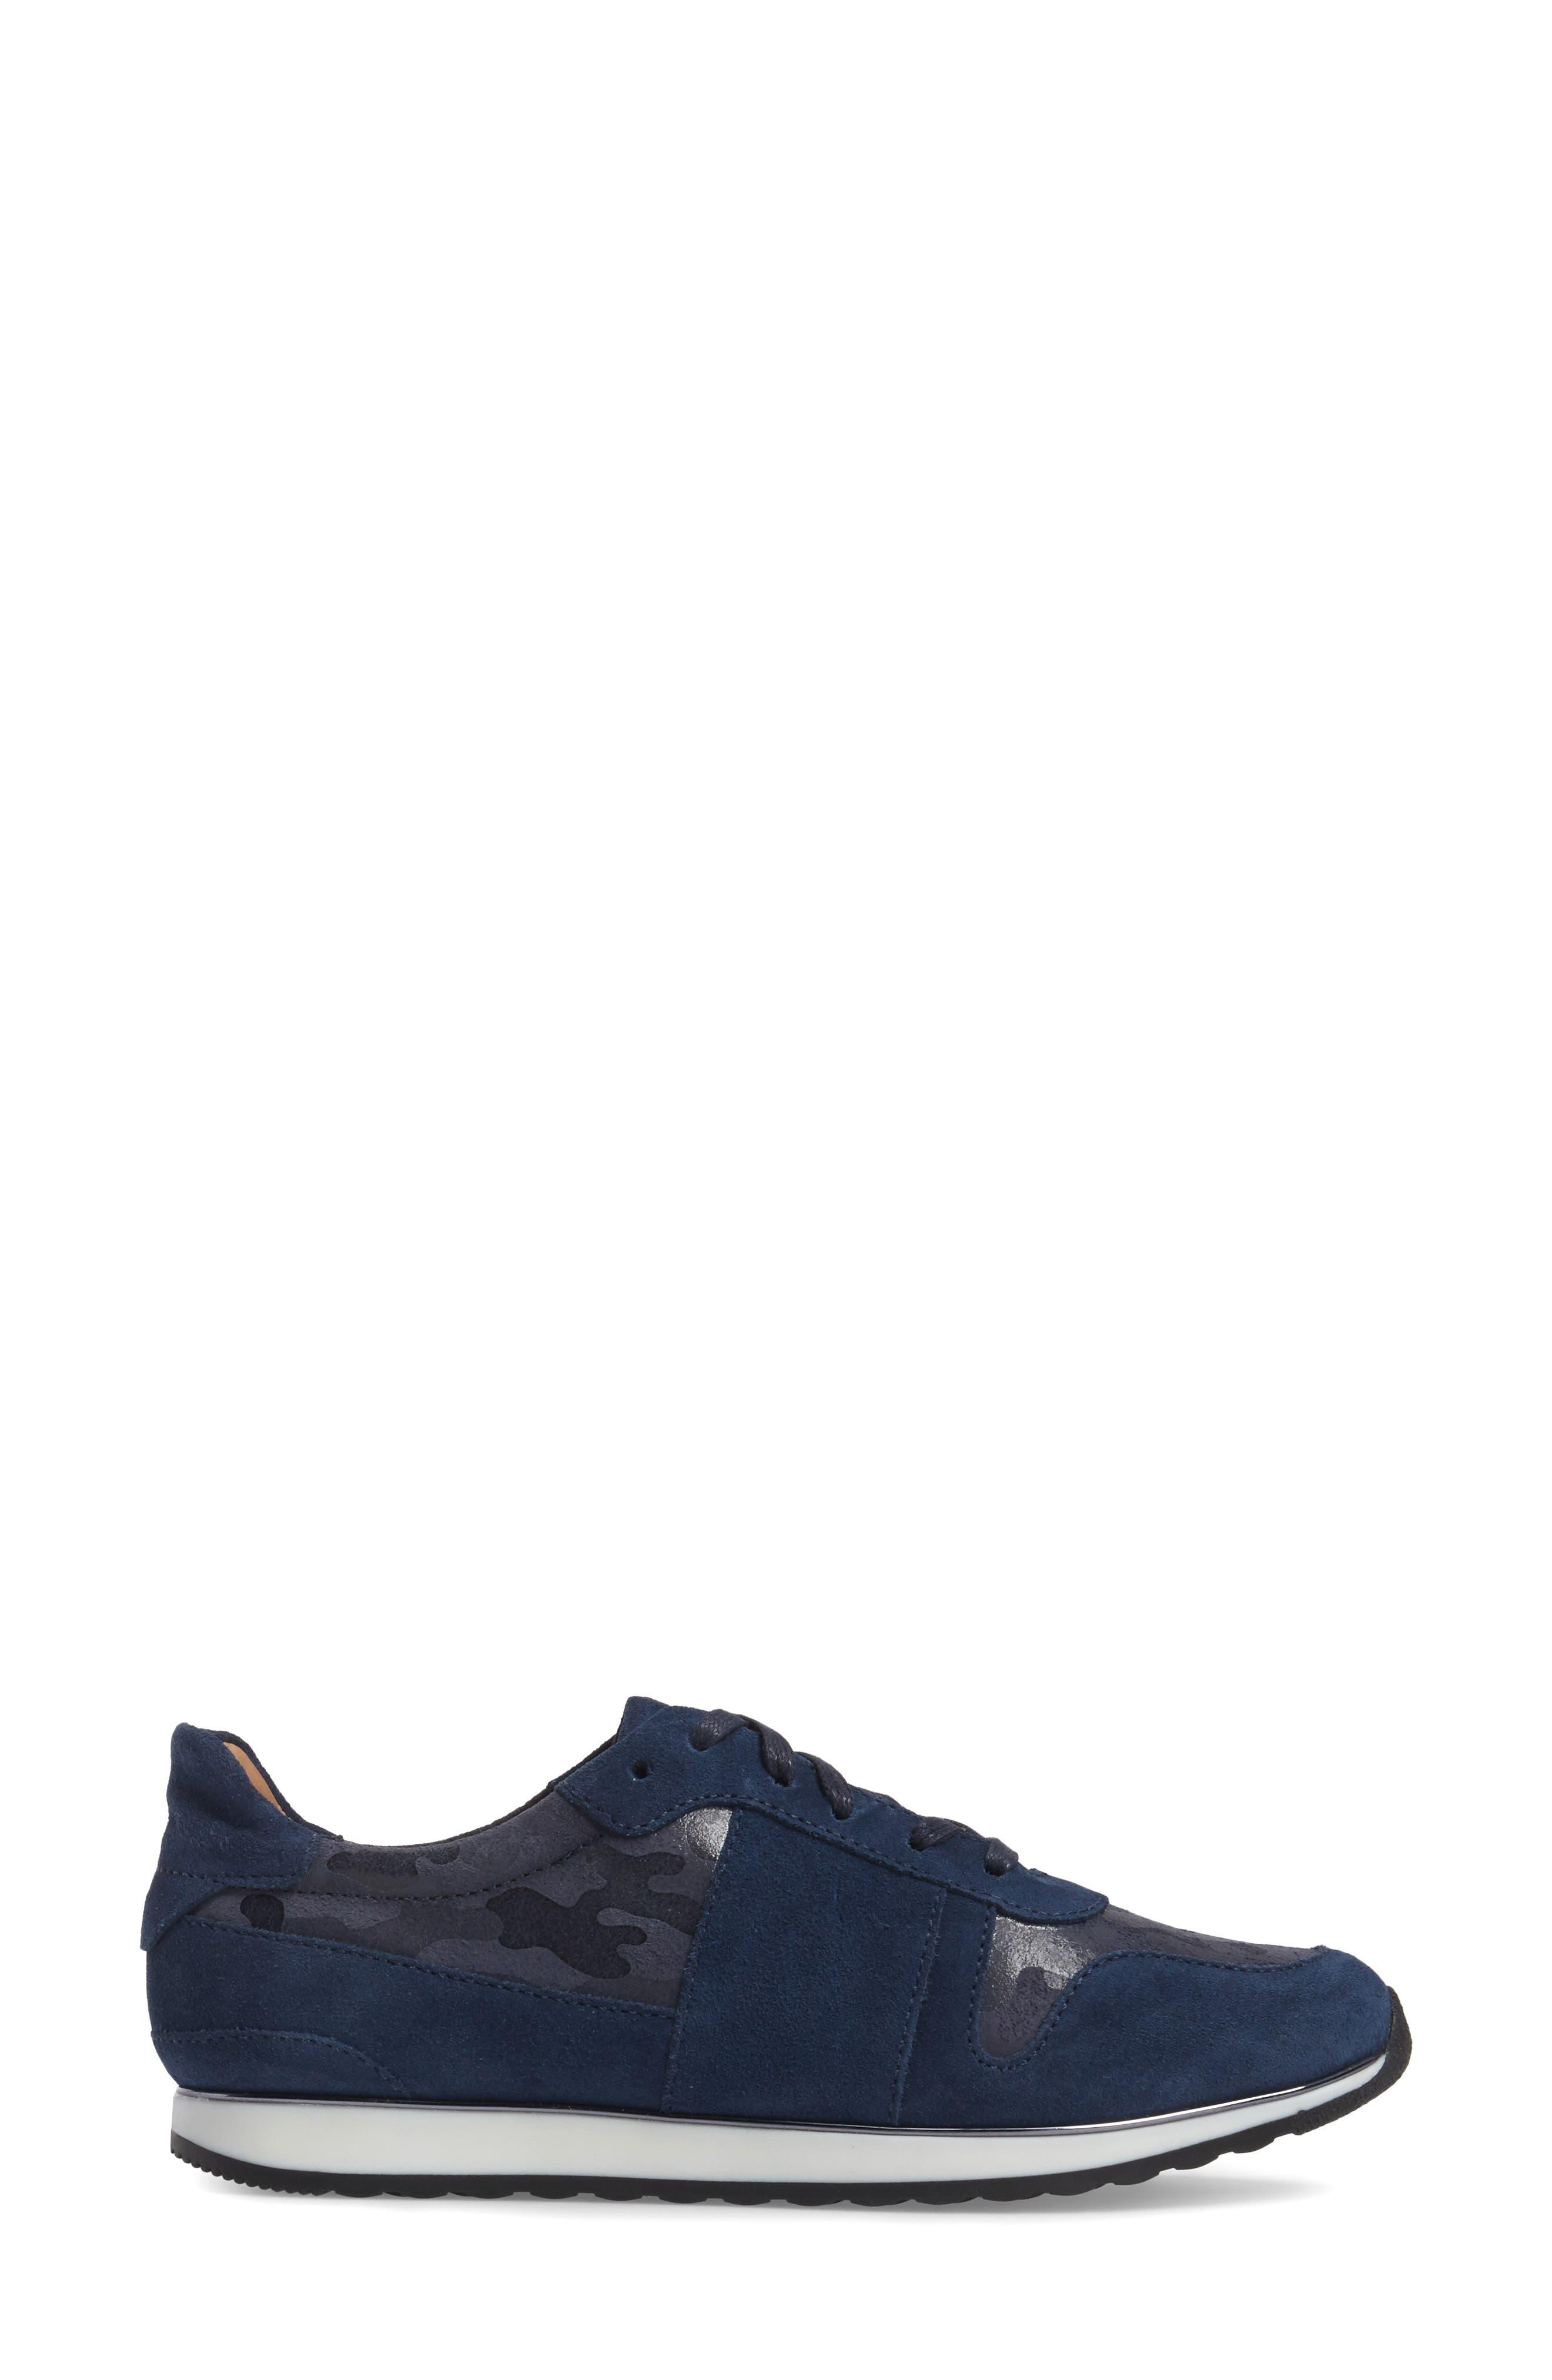 Stefani Sneaker,                             Alternate thumbnail 3, color,                             Camo Nubuck Leather